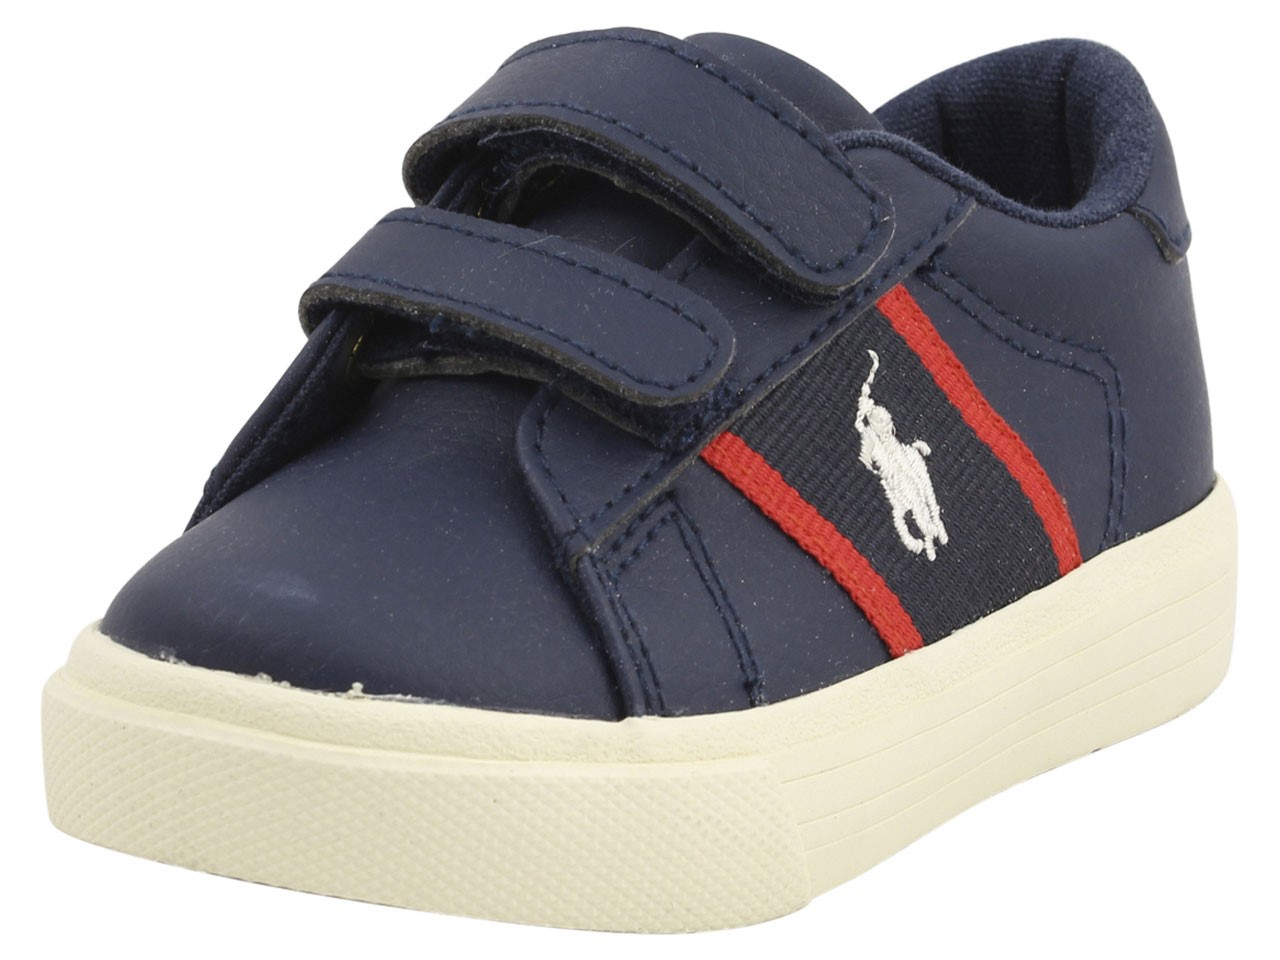 Polo Ralph Lauren - Infant Boys' Polo Ralph Lauren Geoff EZ Sneaker - Toddler - Walmart.com